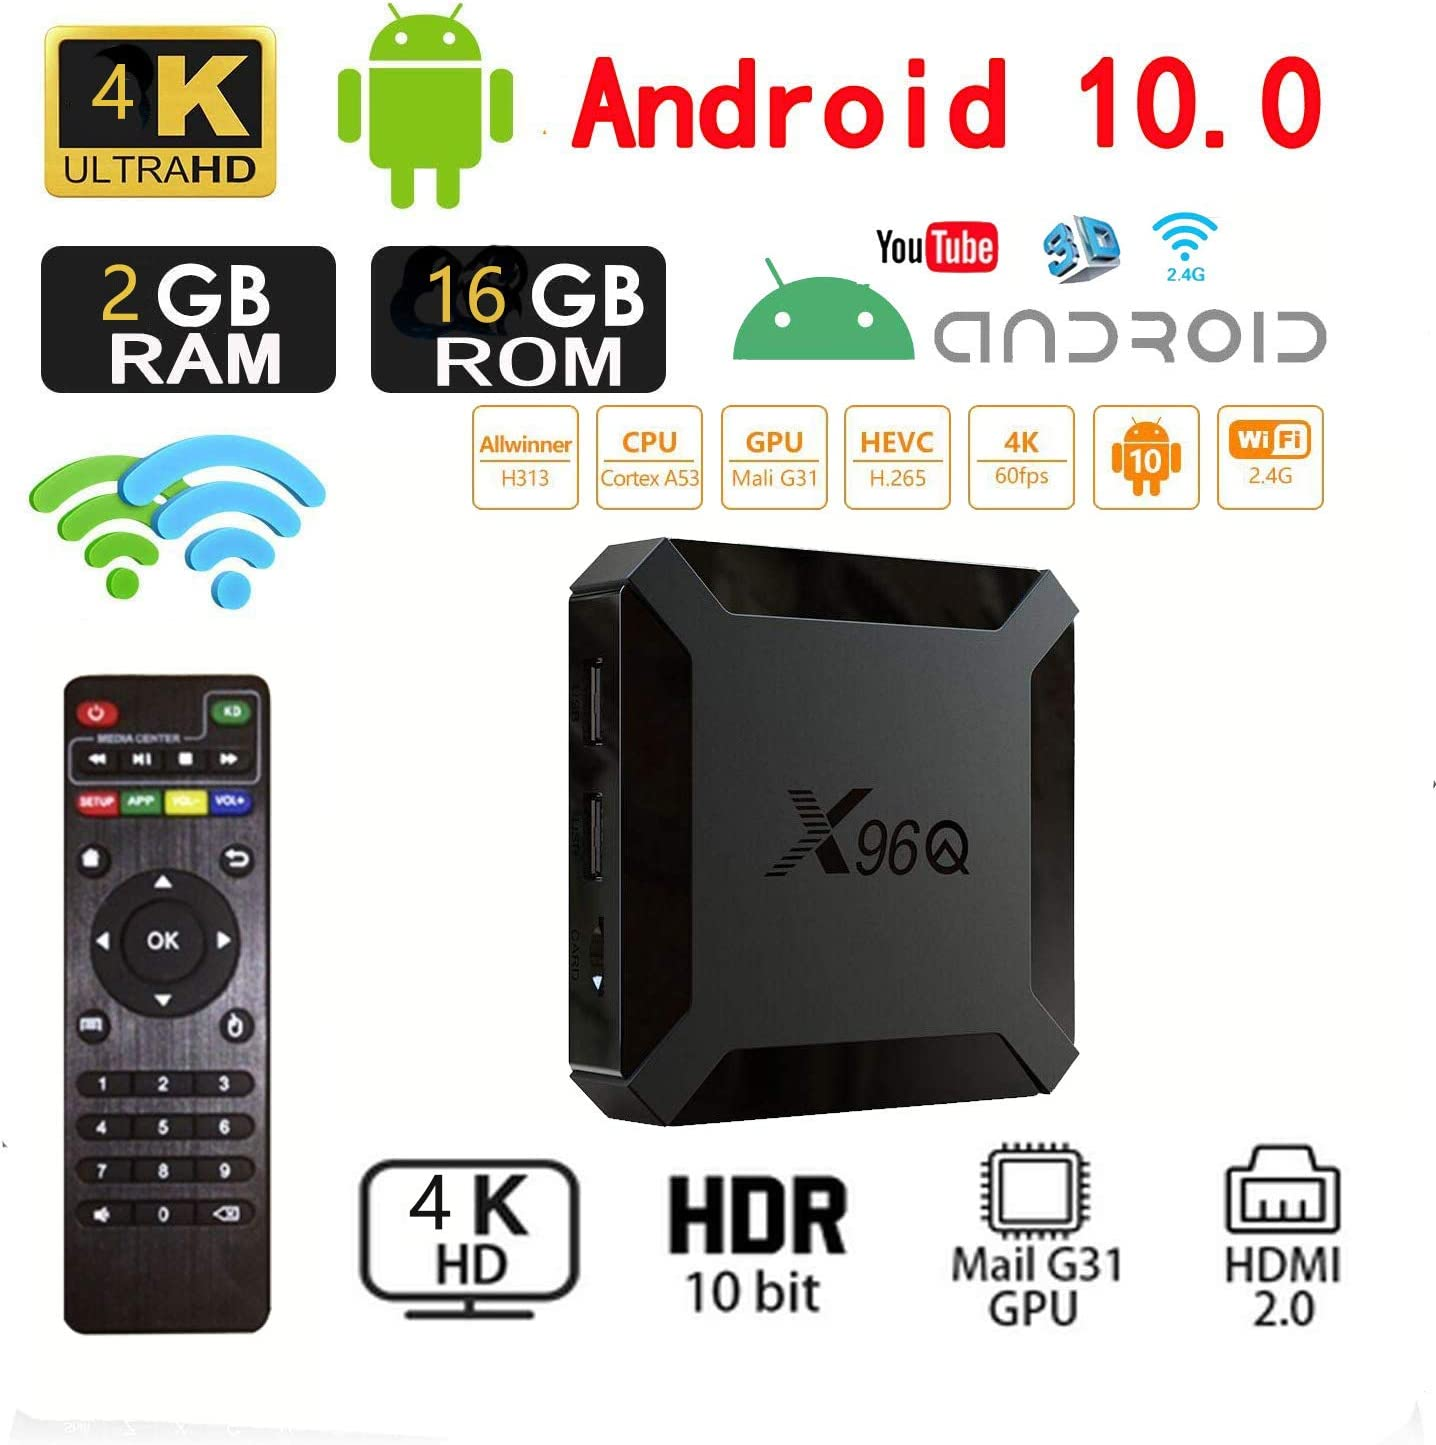 Android 10.0 TV Box, X96 Mini 2020 Versión Mejorada X96Q 2GB RAM 16GB ROM Smart TV Box Allwinner H313 Soporte Quad Core 4K 3D Set Top Box X96 Mini WiFi Home Media